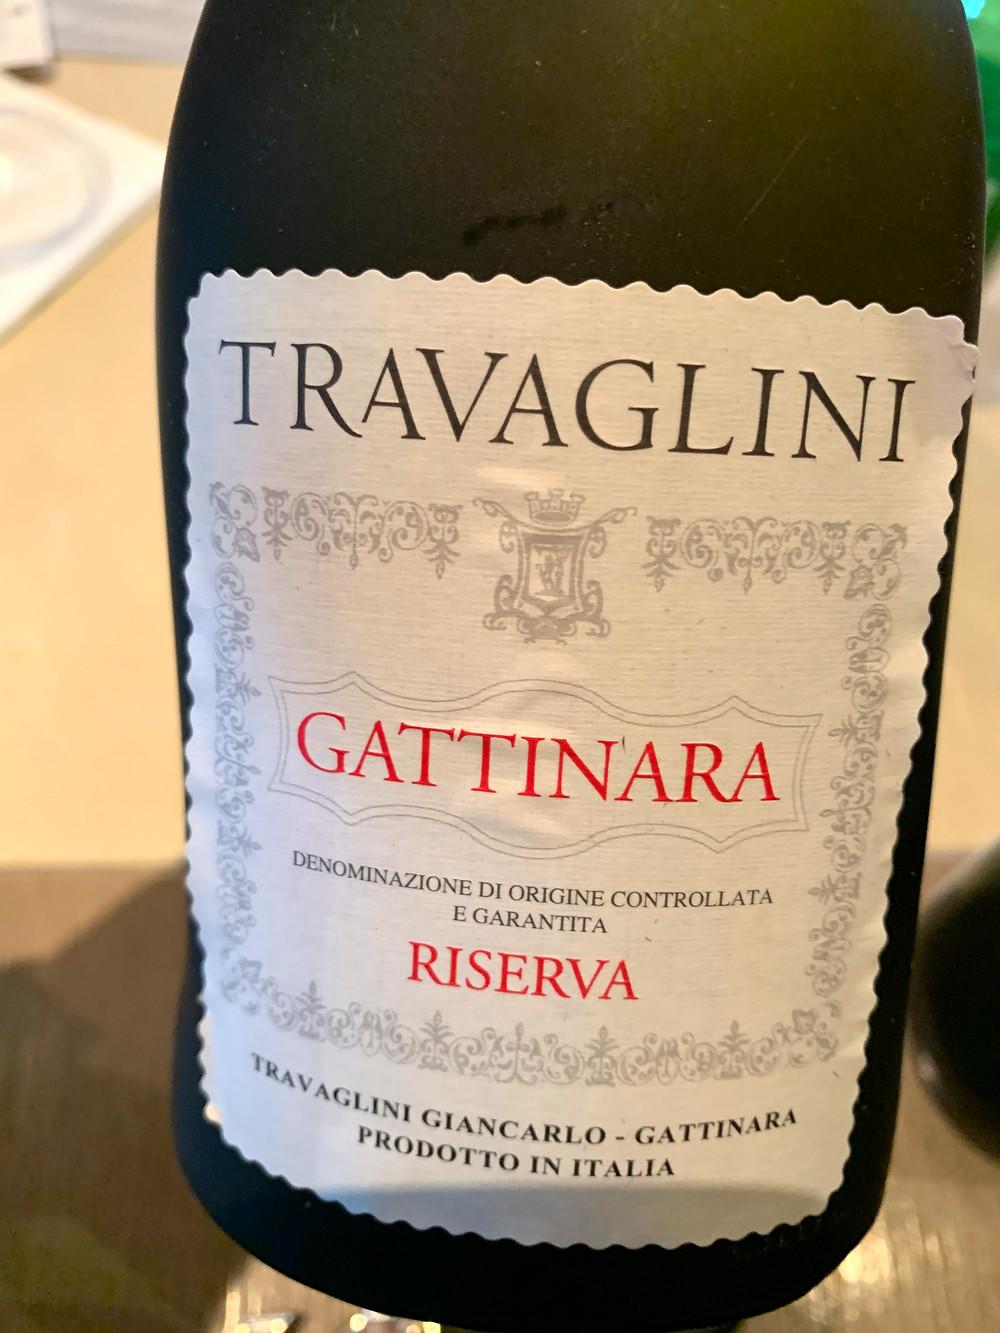 Travaglini, Gattinara, Piemonte